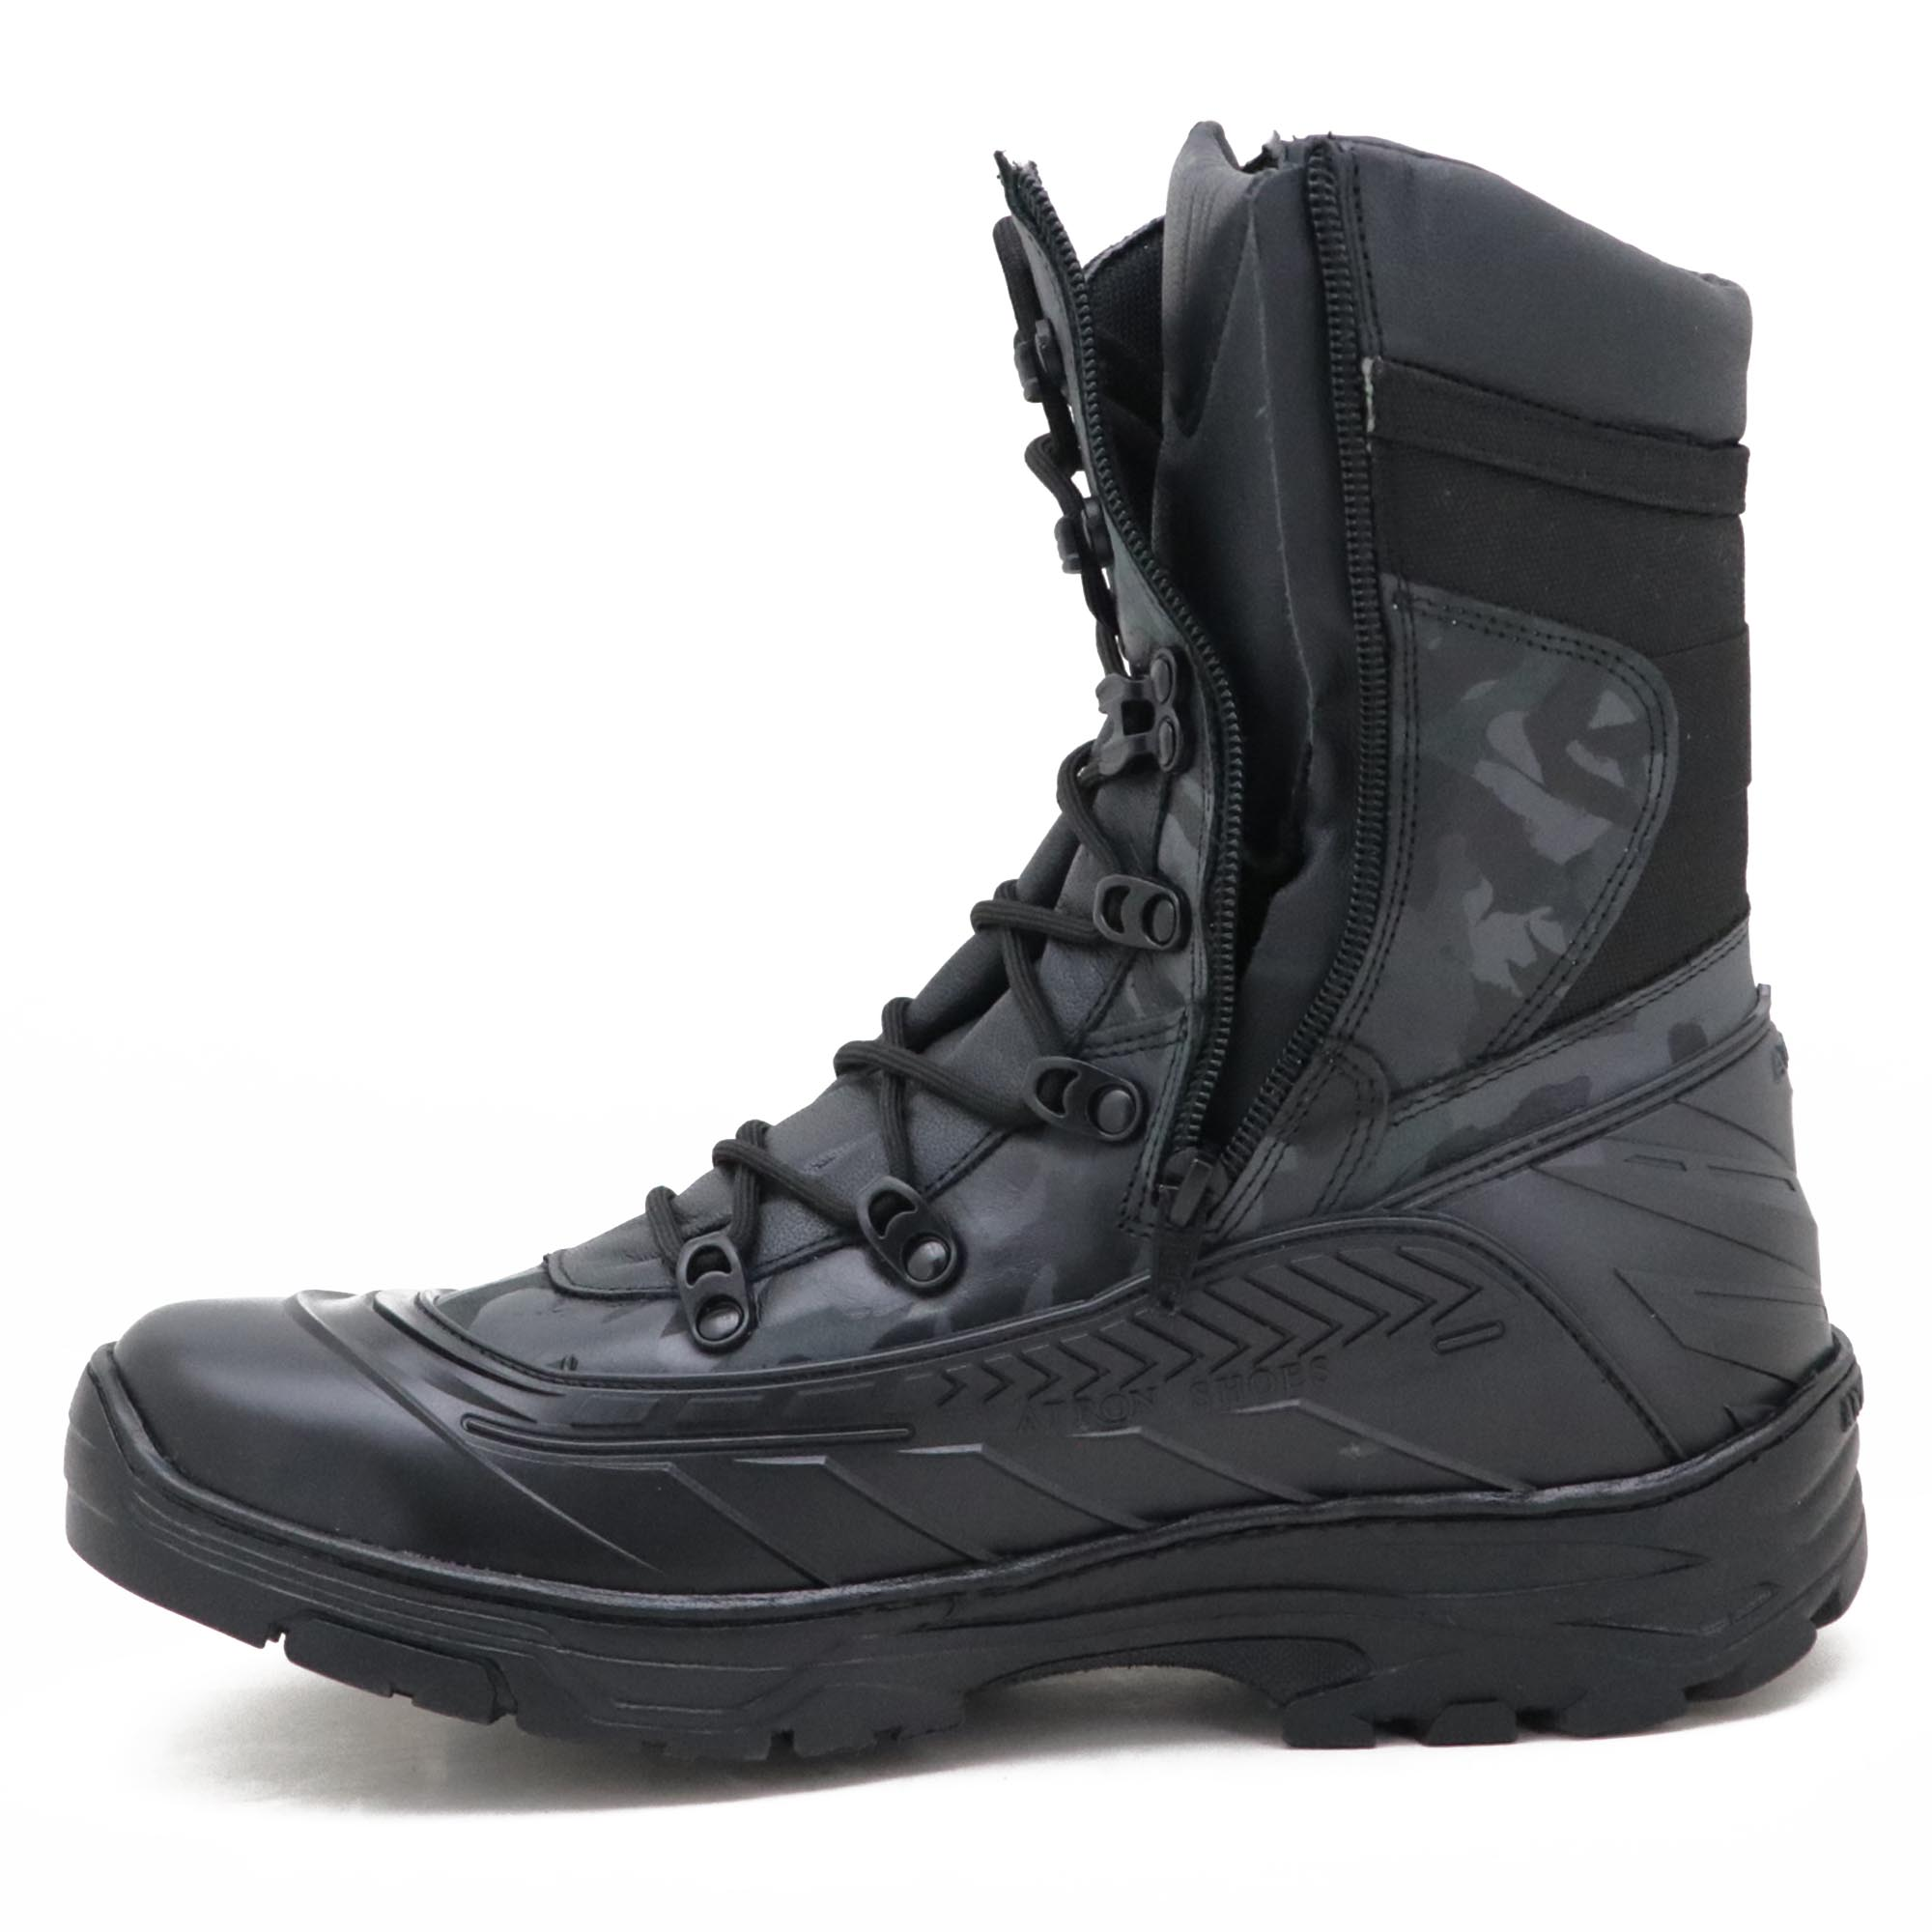 Coturno militar emborrachado em couro legítimo na cor cinza camuflado 289